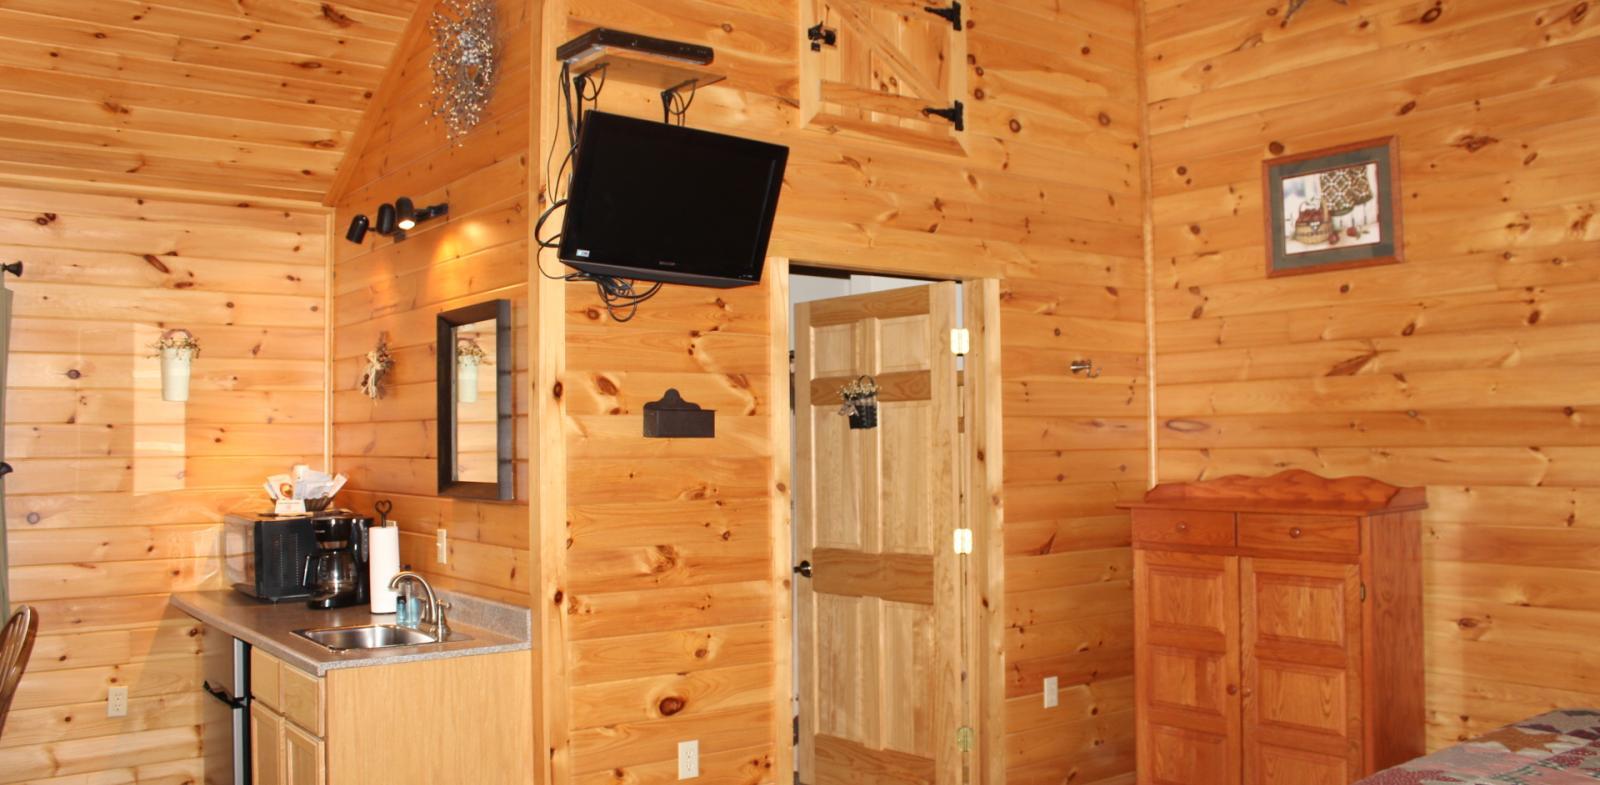 TV and bathroom entrance